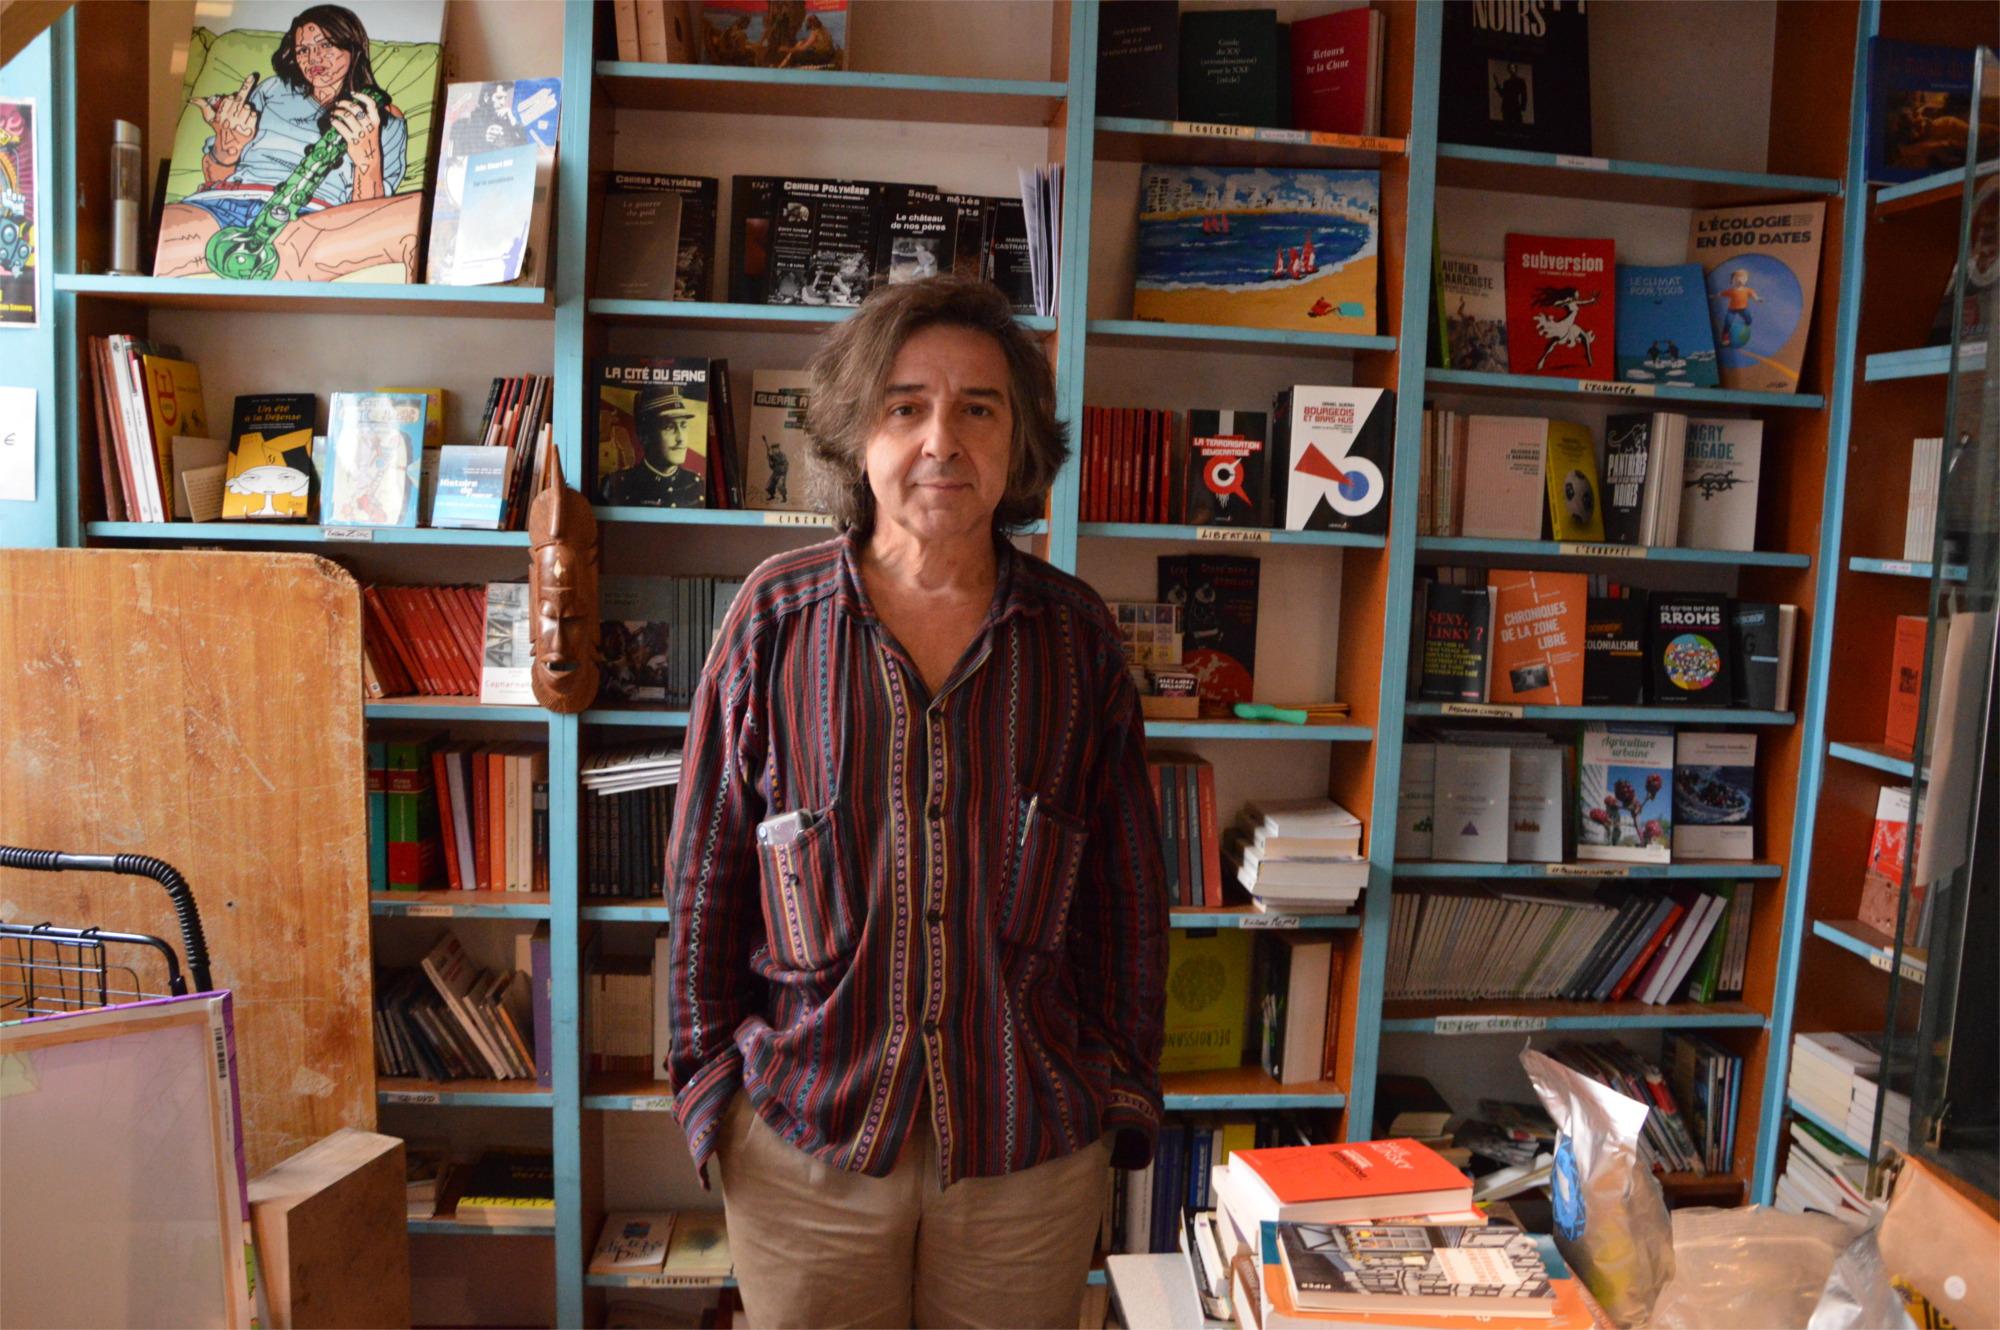 migrant-accueil-librairie-lady long solo-Utopia 56